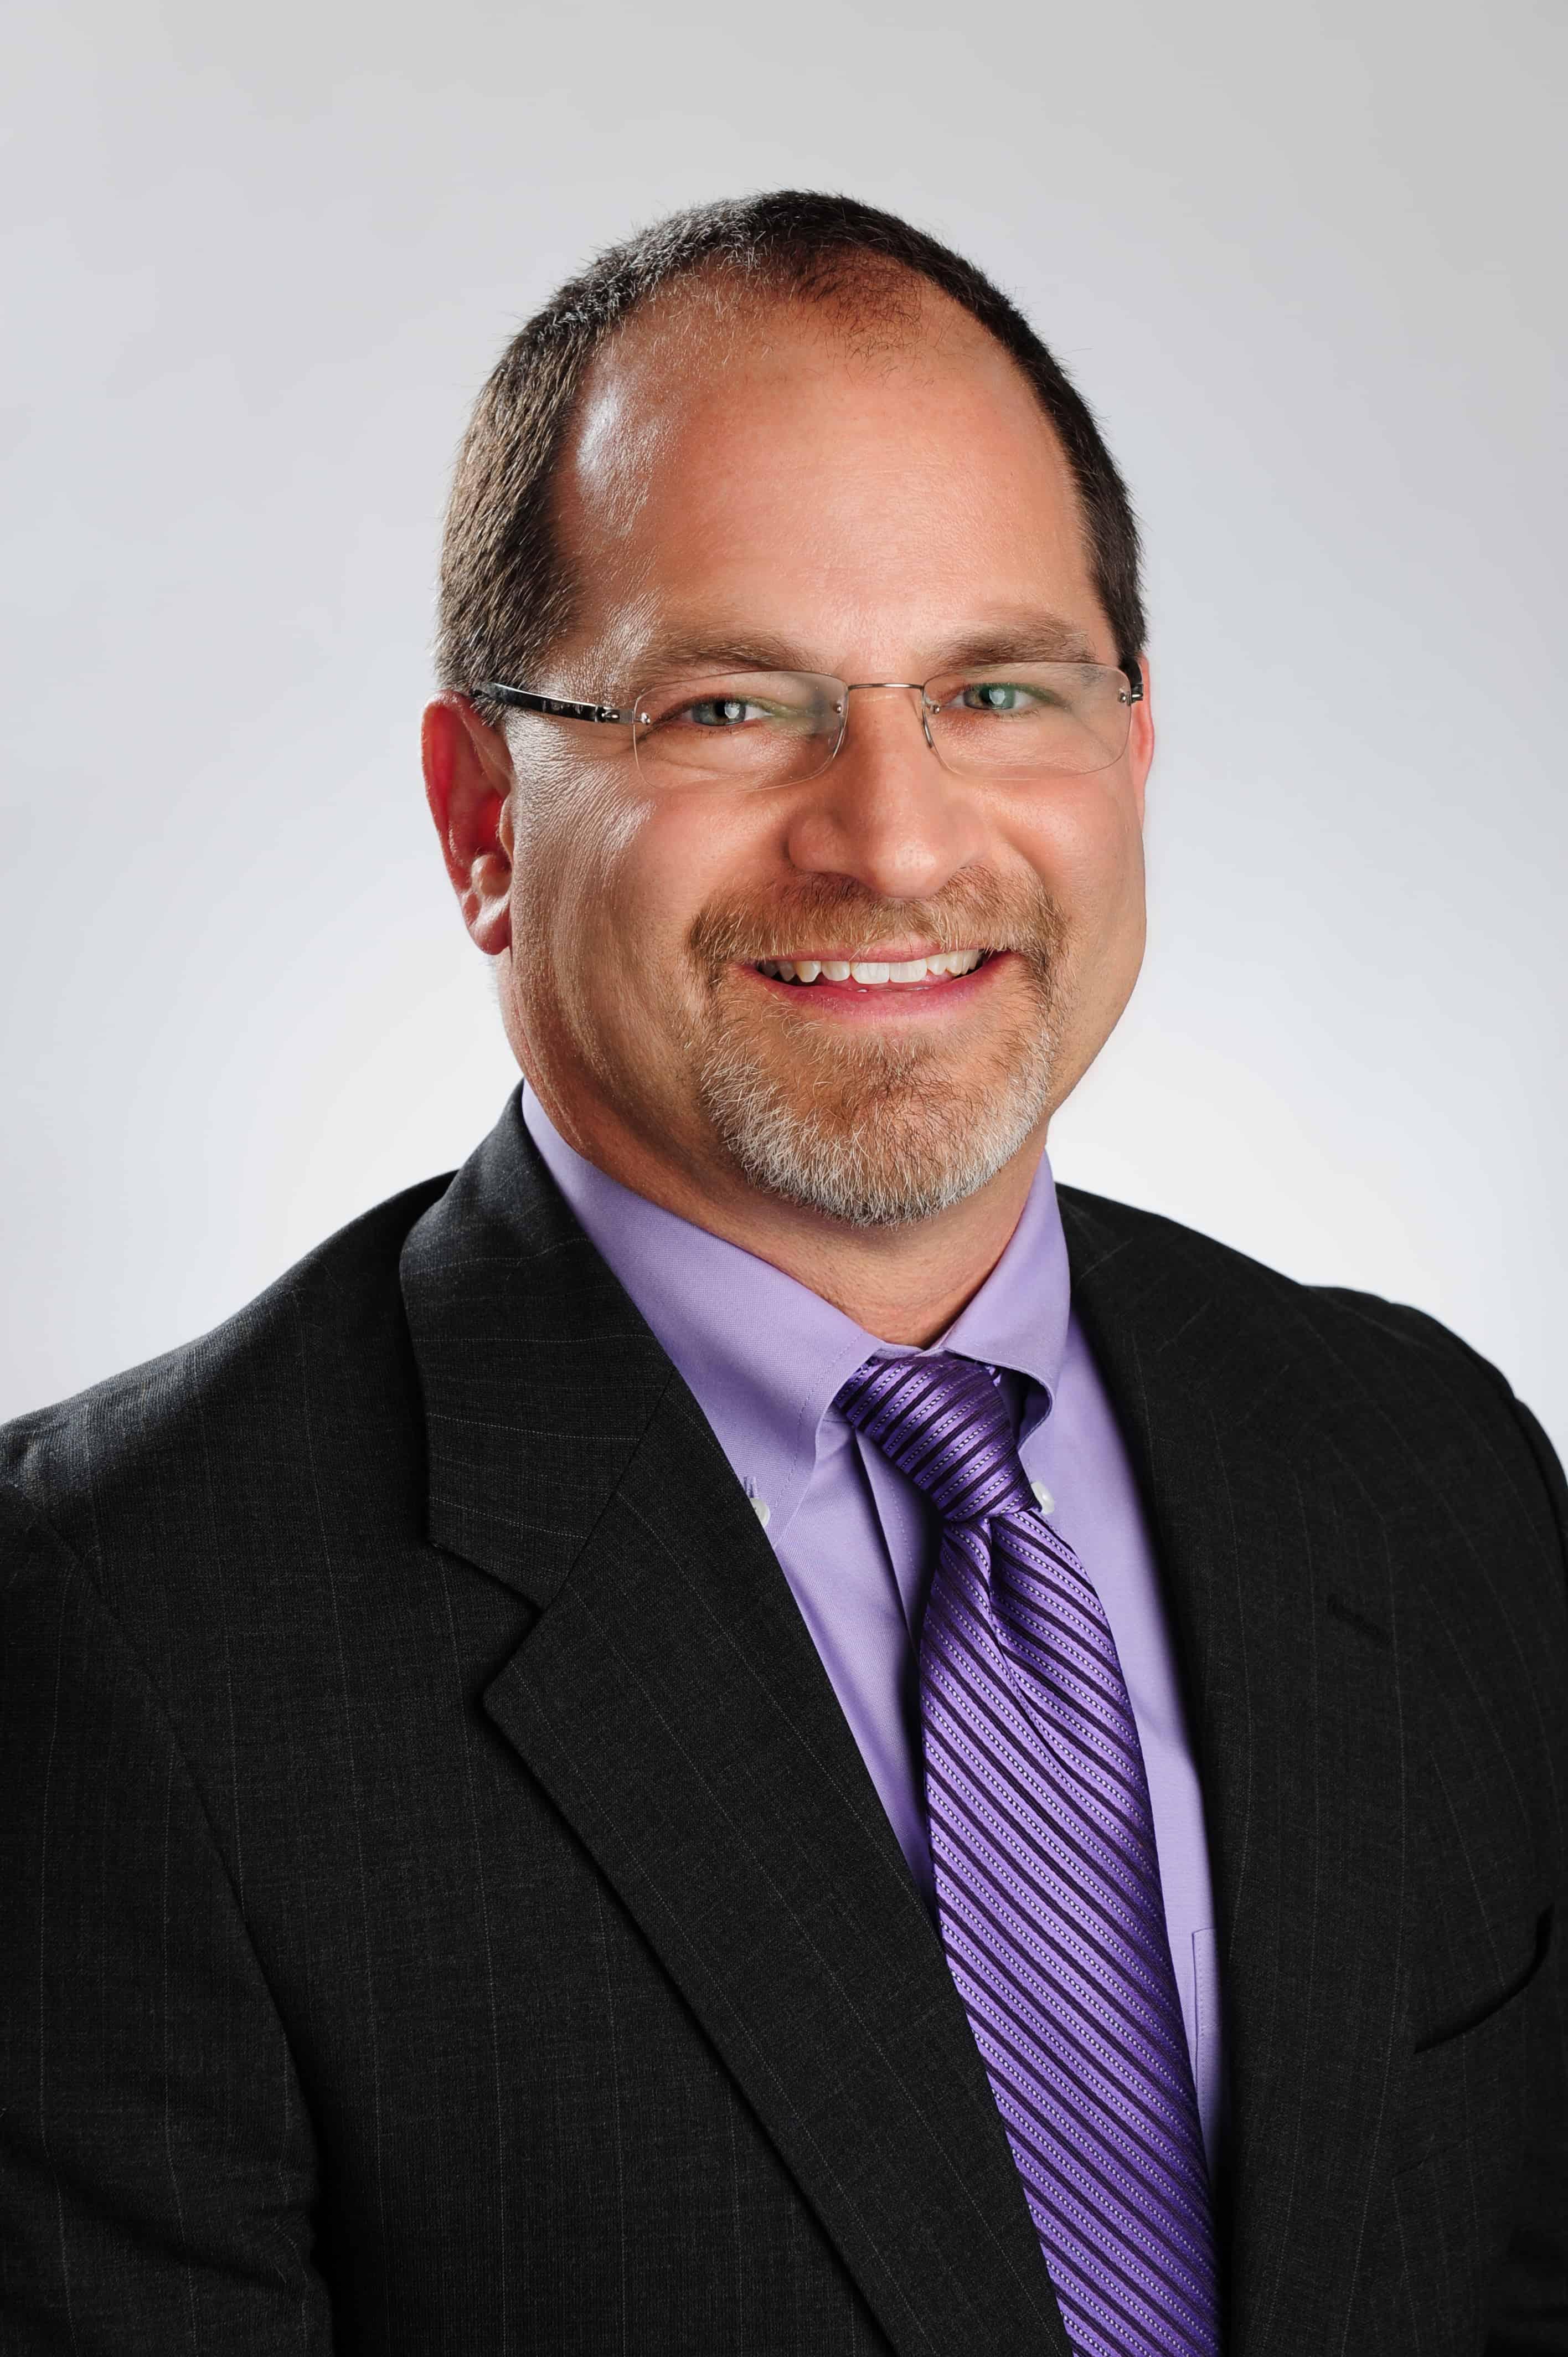 Dr. Gene S. Mirkin